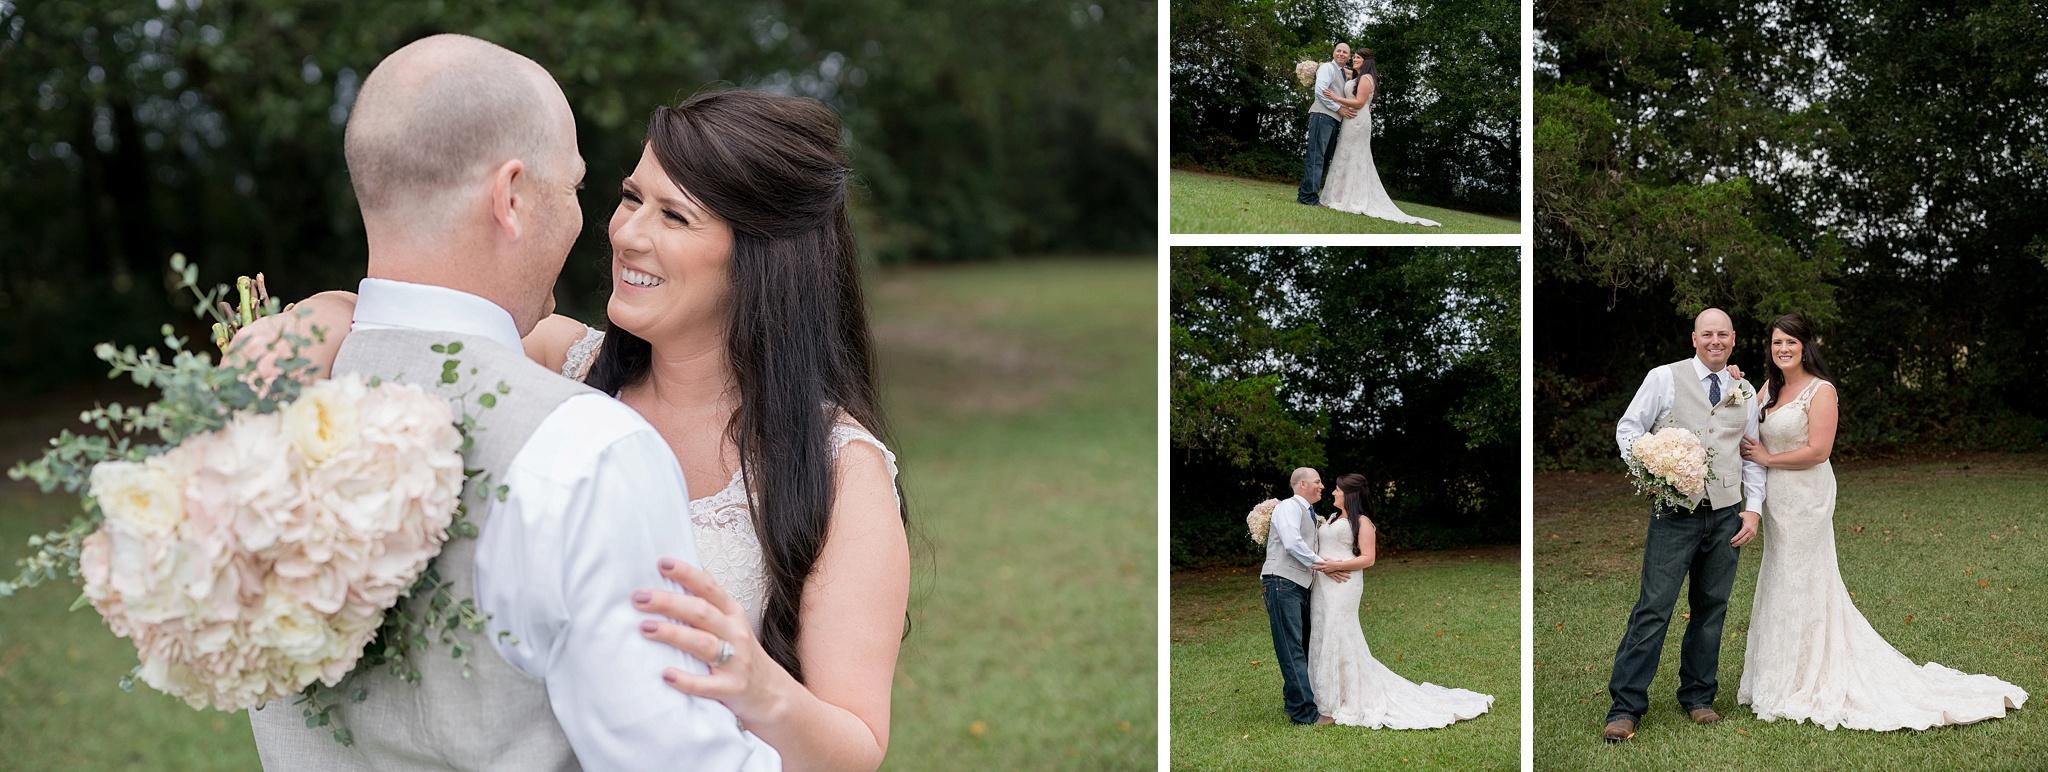 Tarboro-NC-Wedding-Photographer-028.jpg